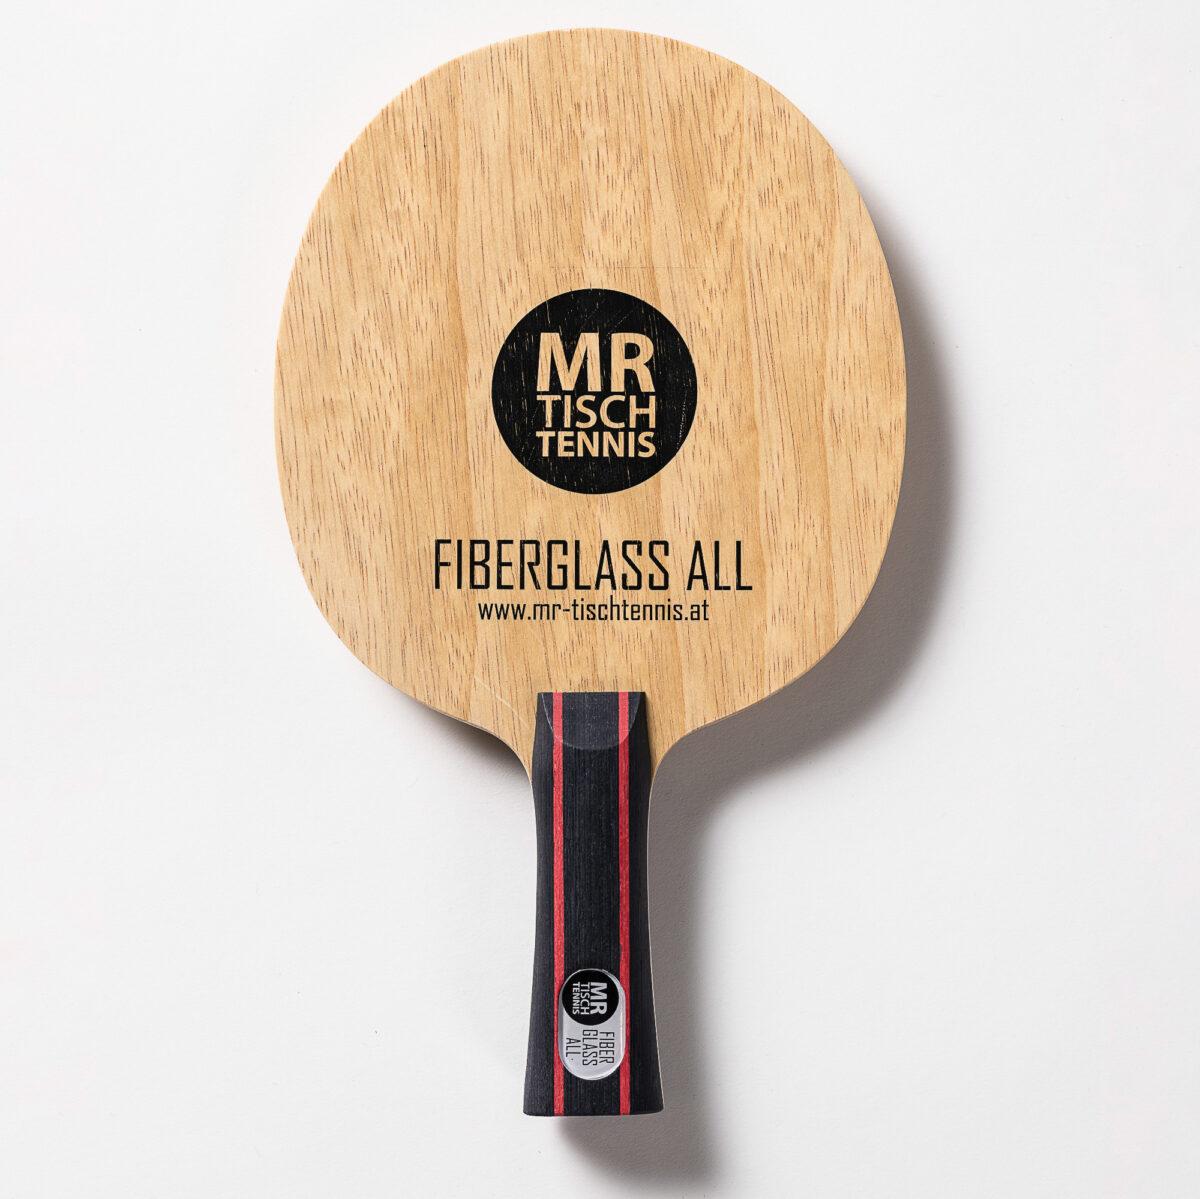 Mr. Tischtennis Fiberglass All konkav